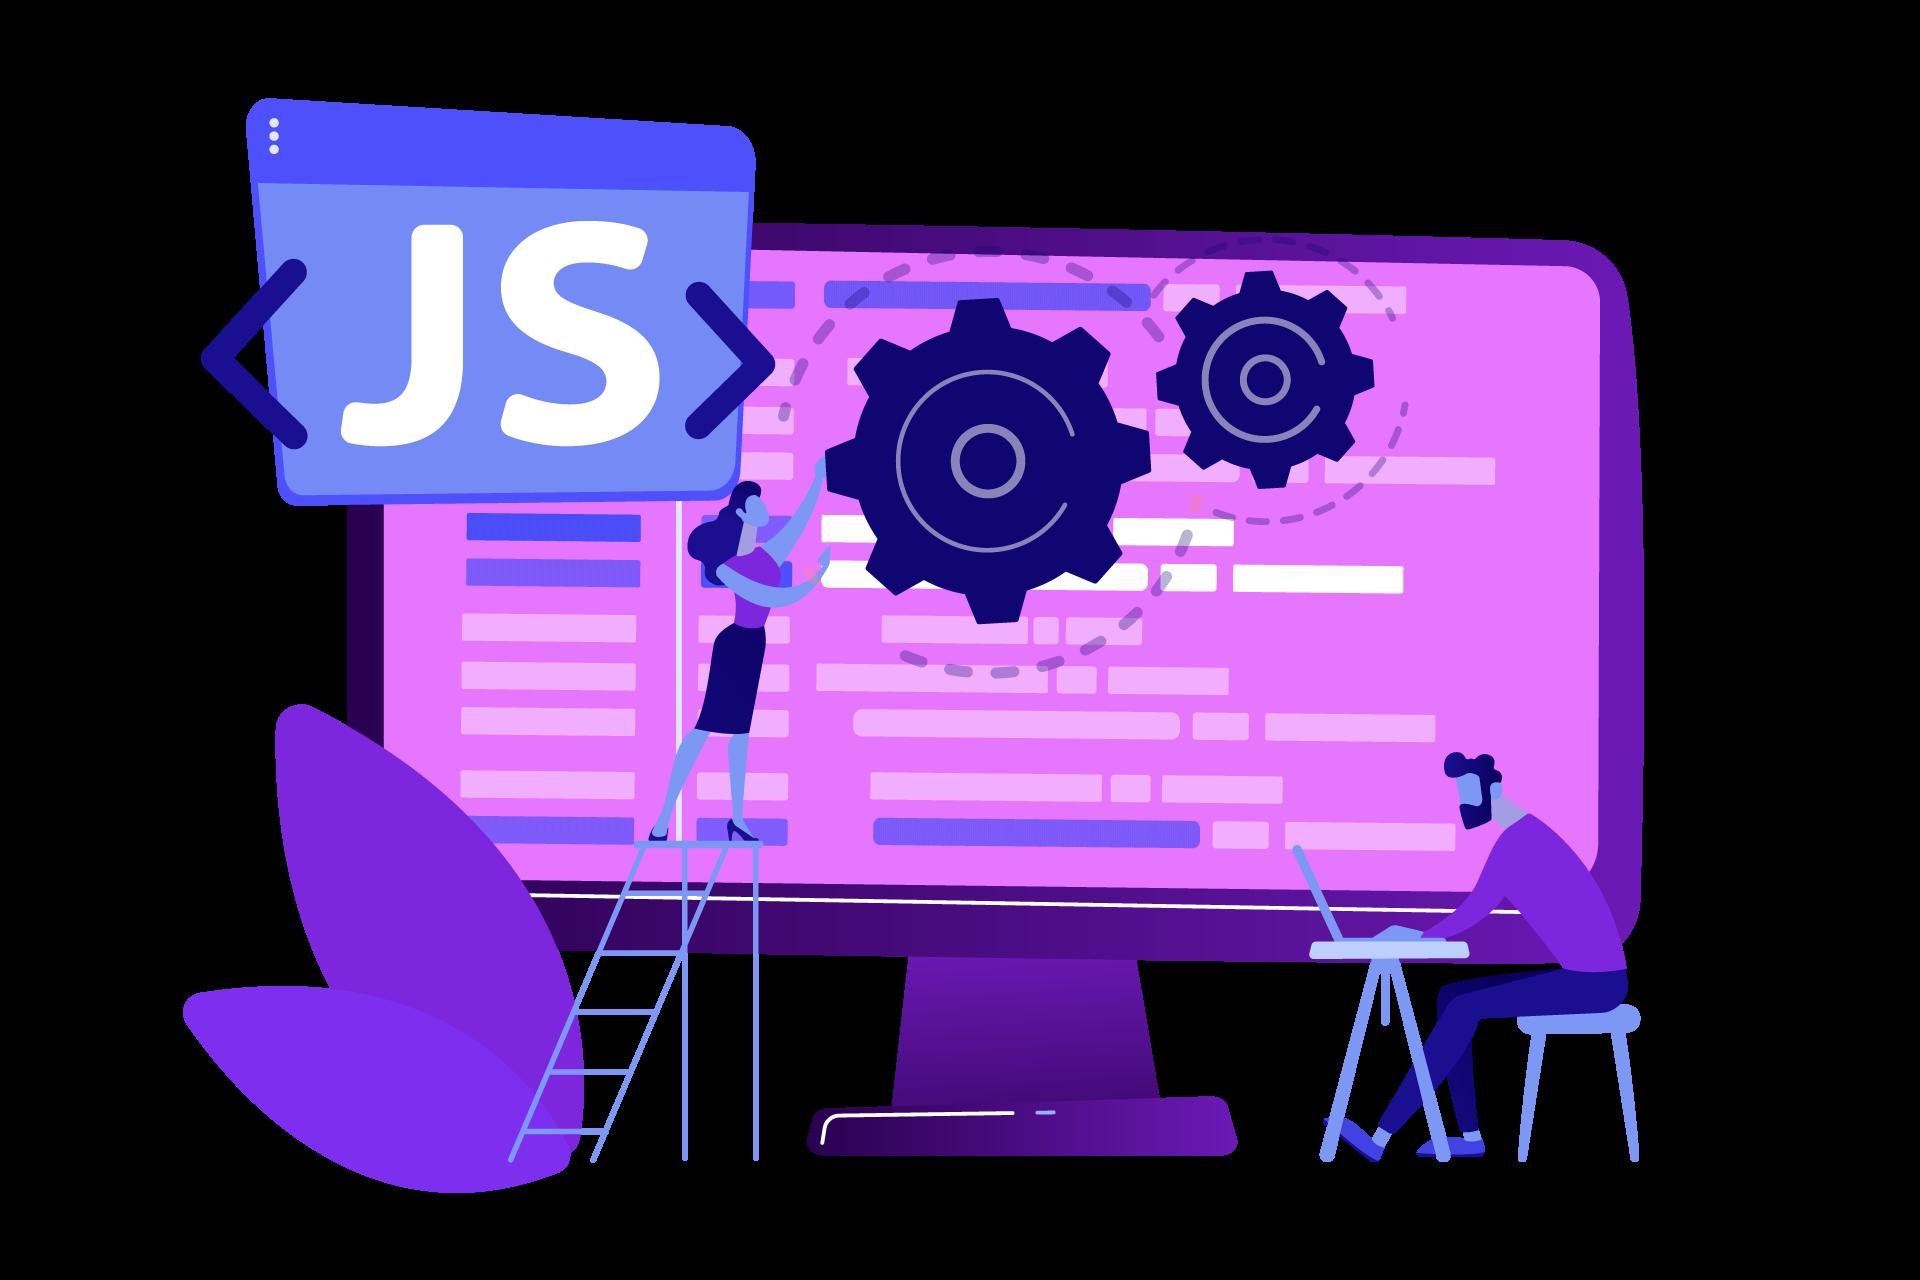 JS illustration